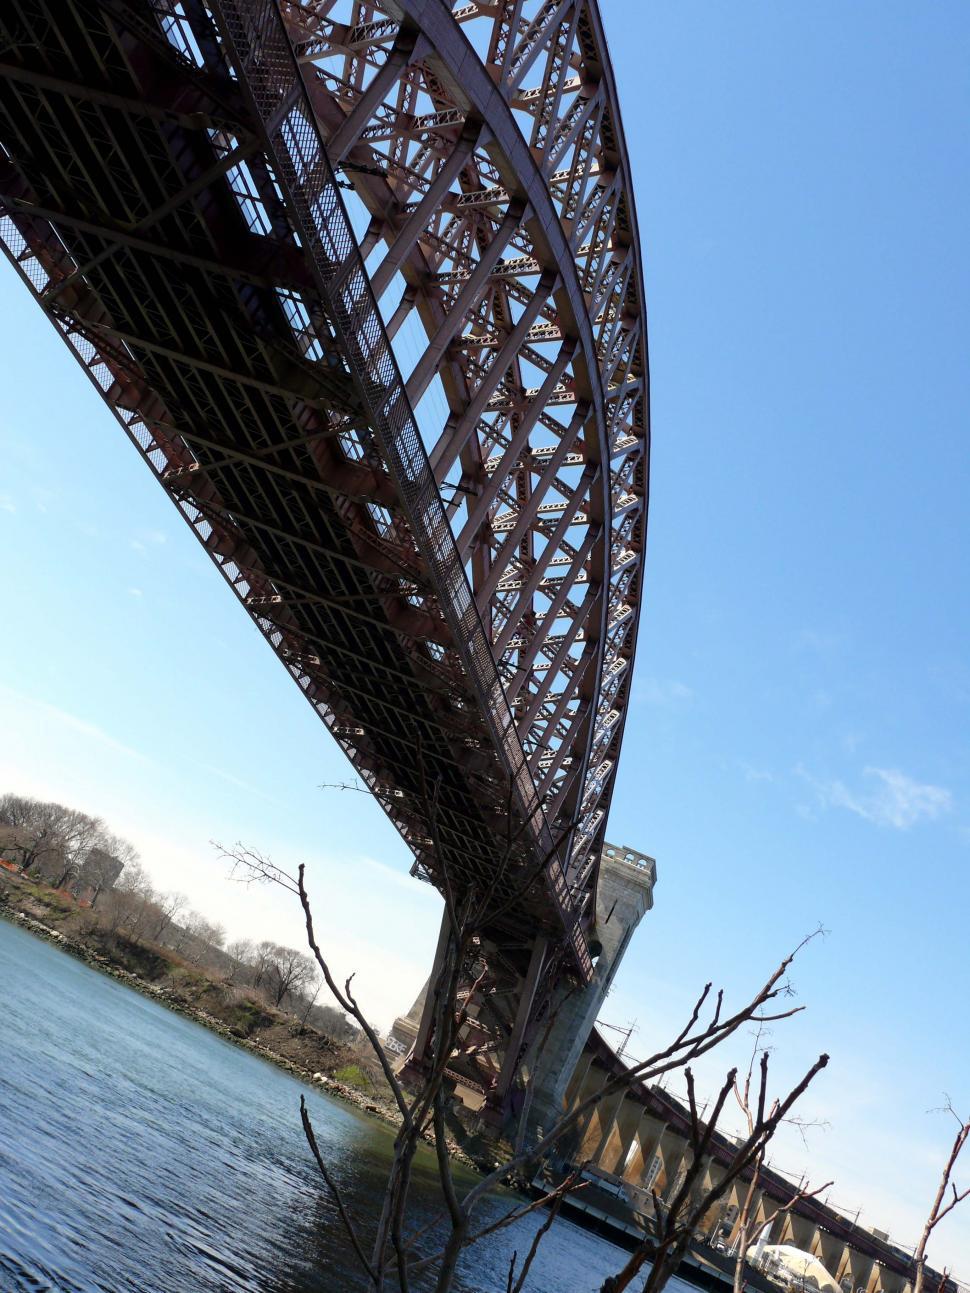 Download Free Stock HD Photo of hellgate bridge Online